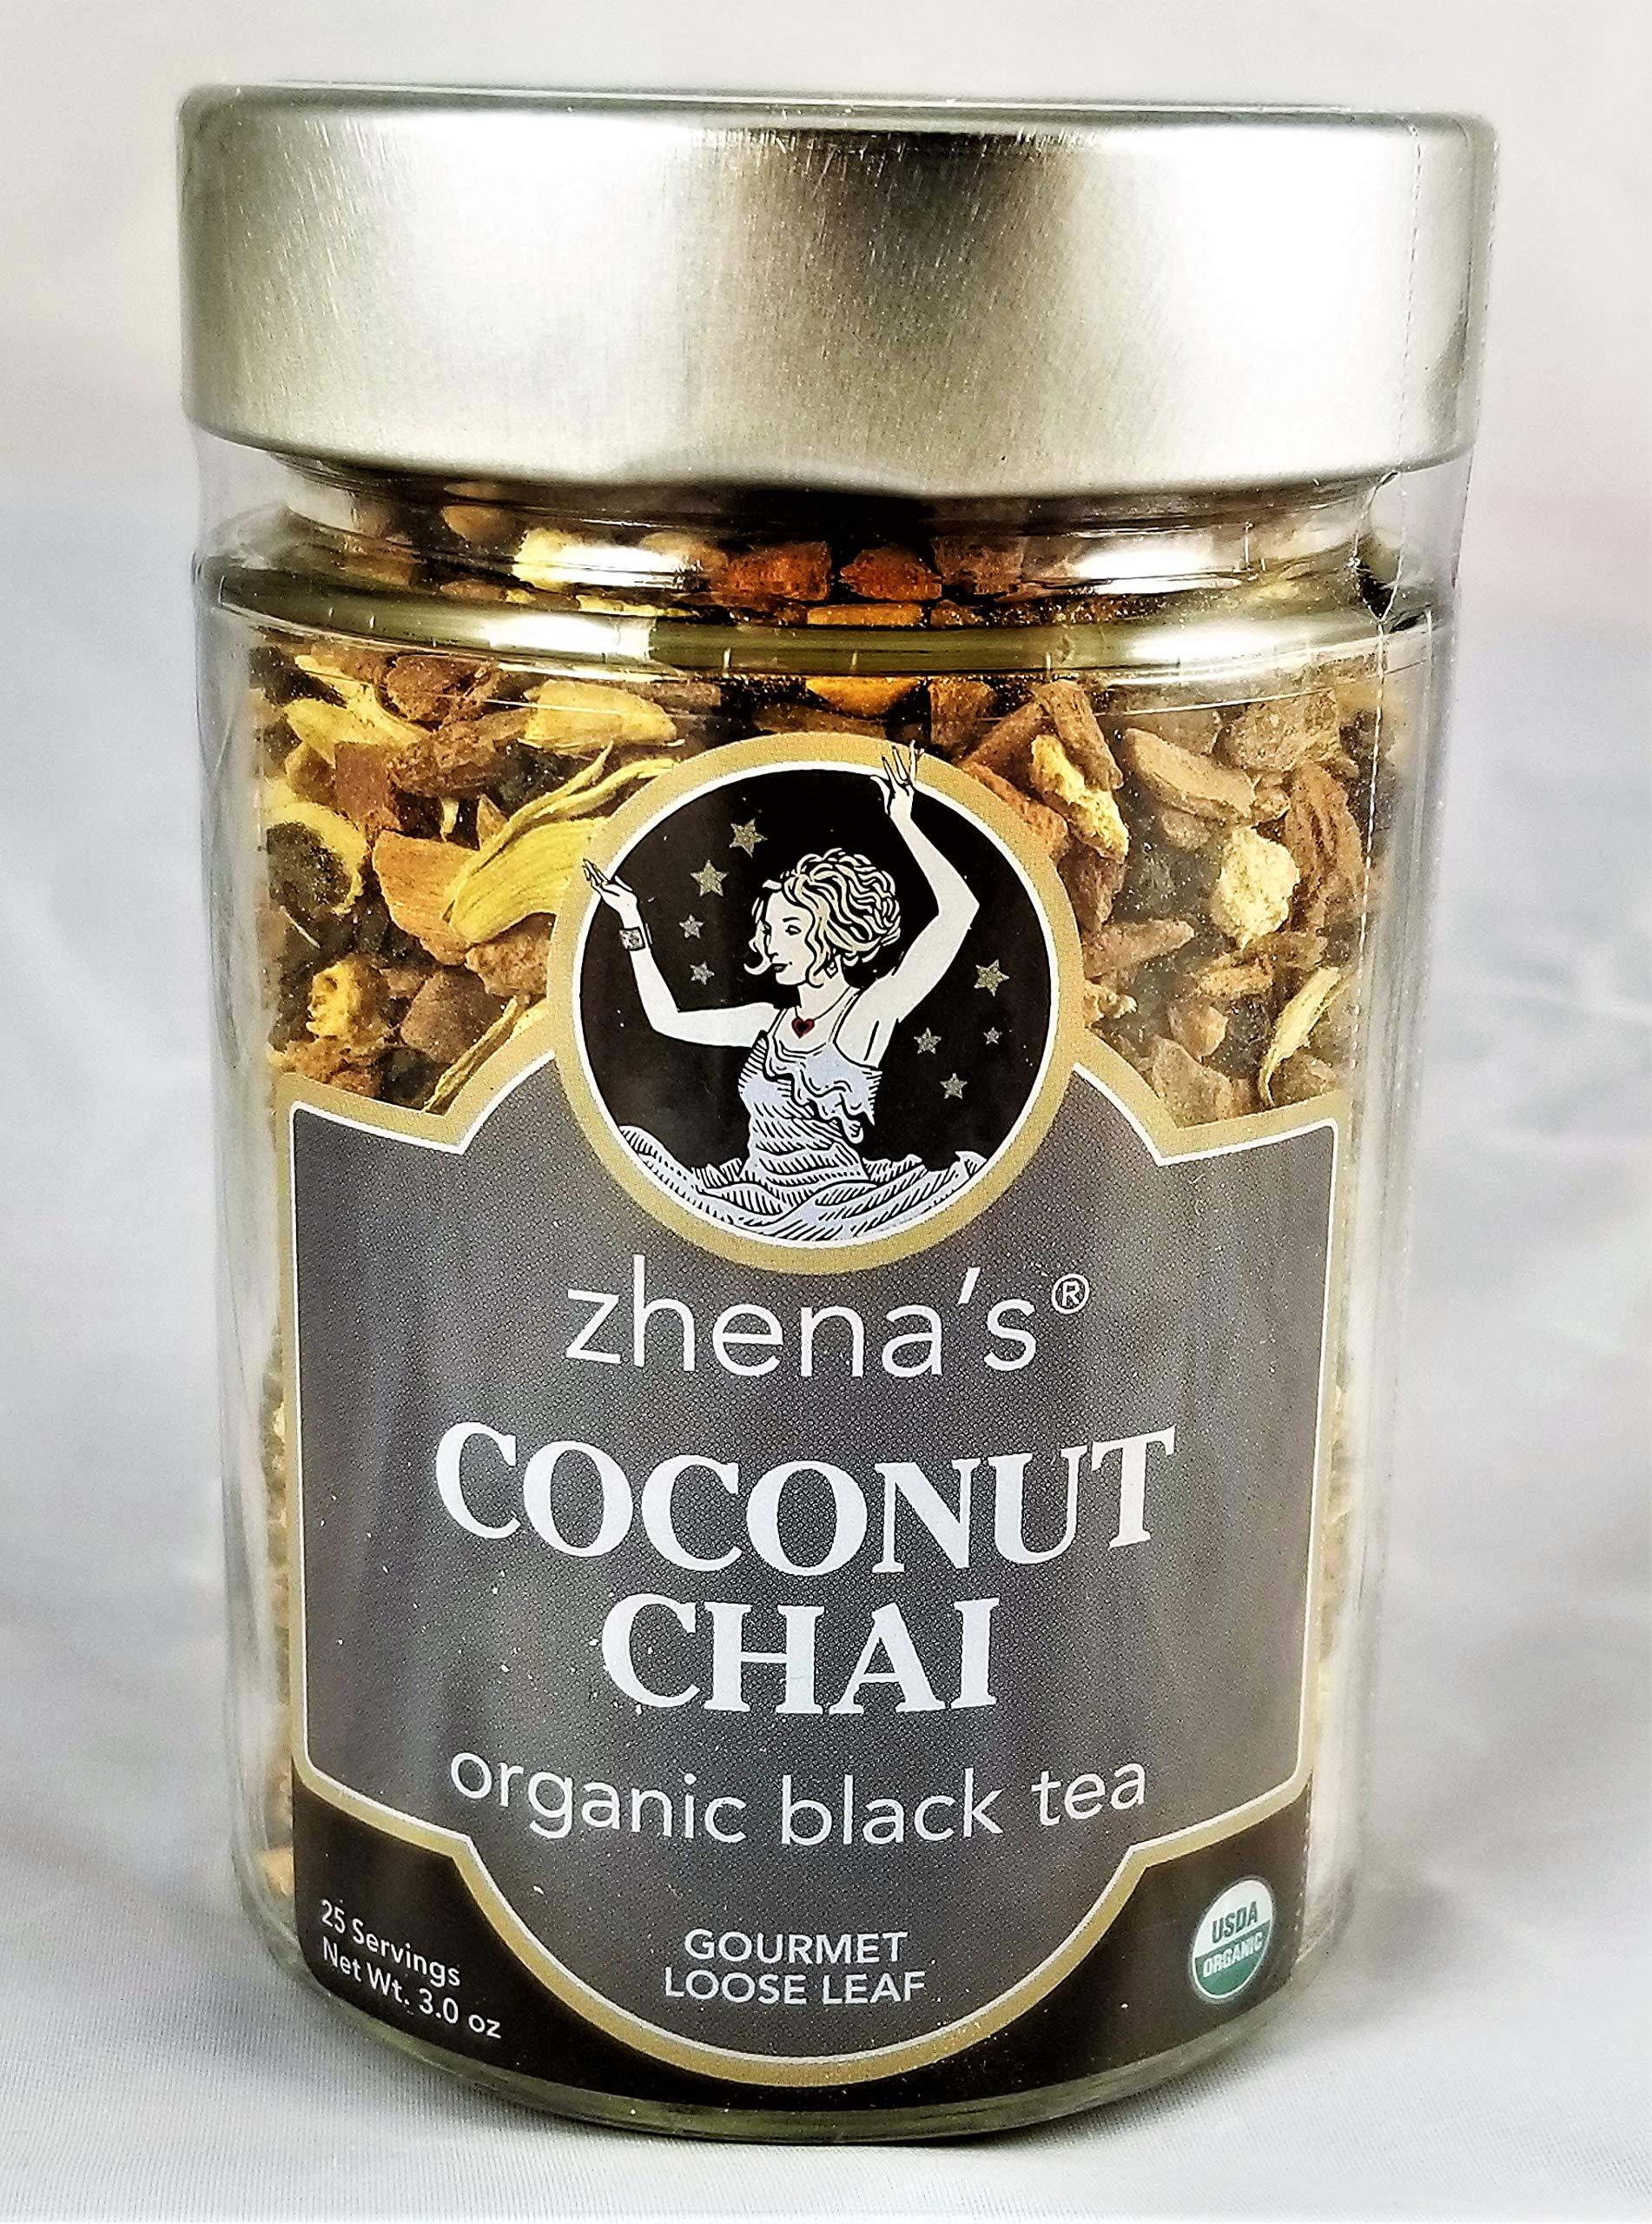 Zhena's Organic Coconut Chai Black Tea, loose leaf, 3 Oz. - Case of 4